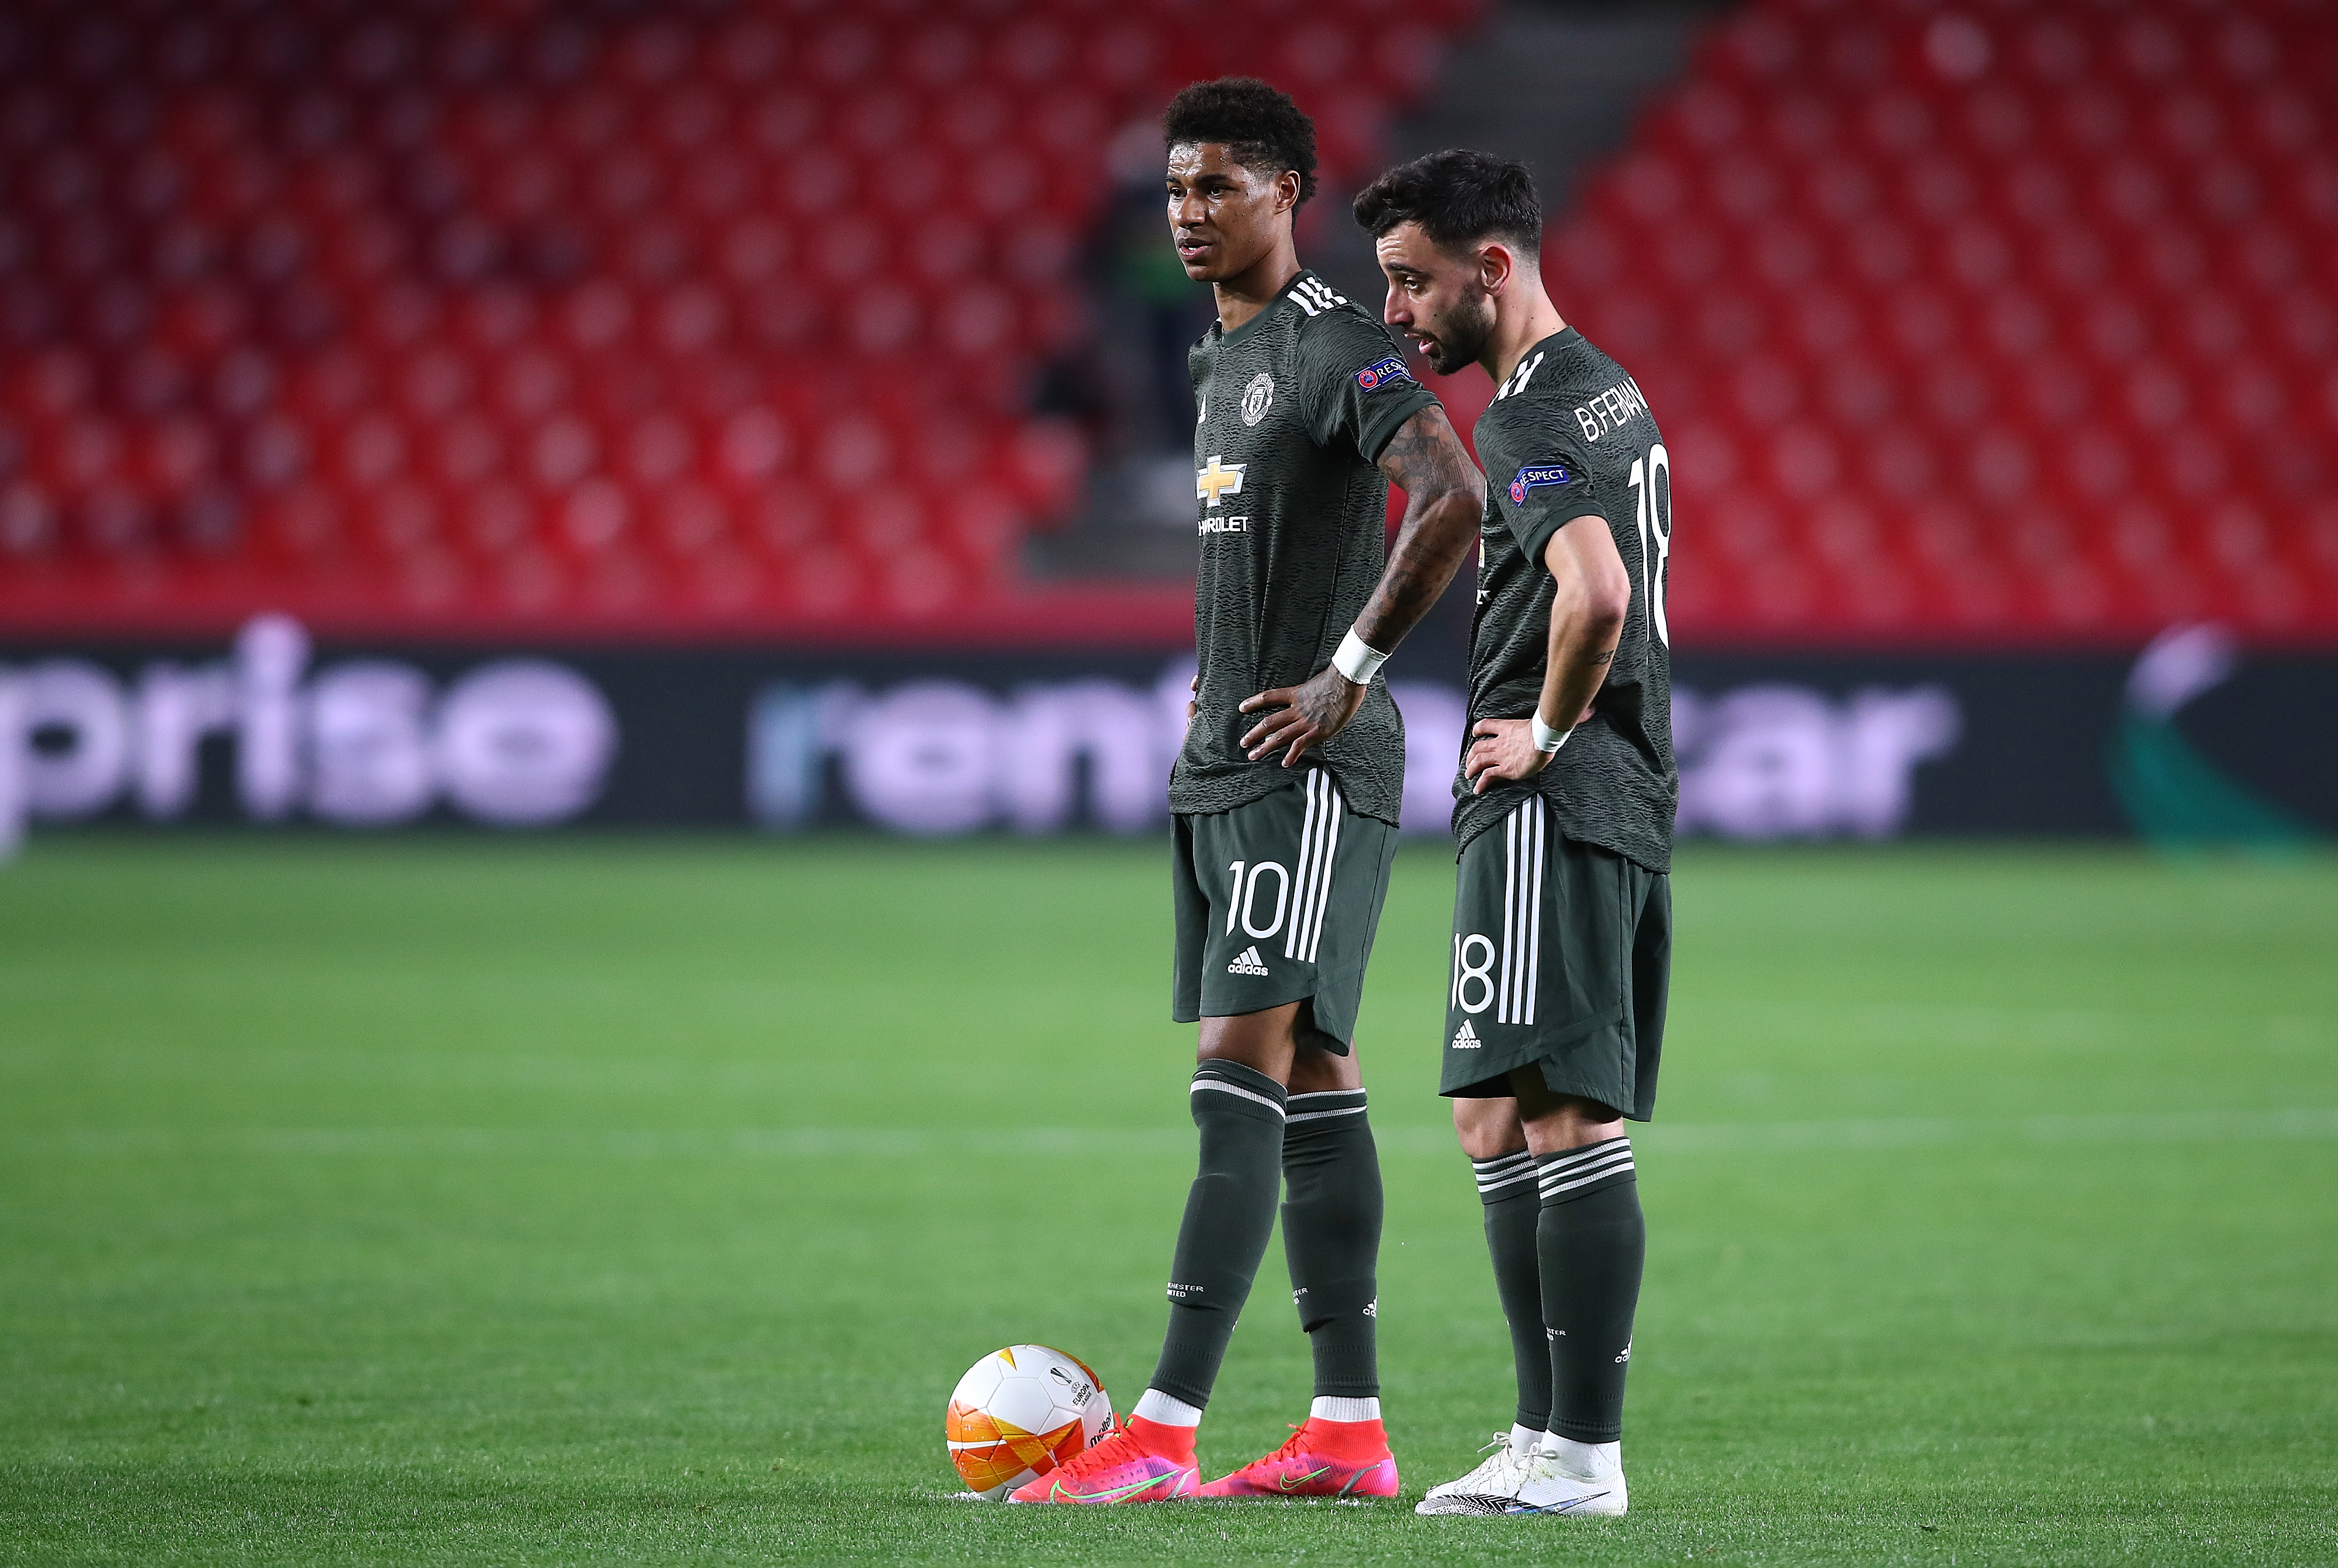 Marcus Rashford and Bruno Fernandes - Manchester United - Premier League